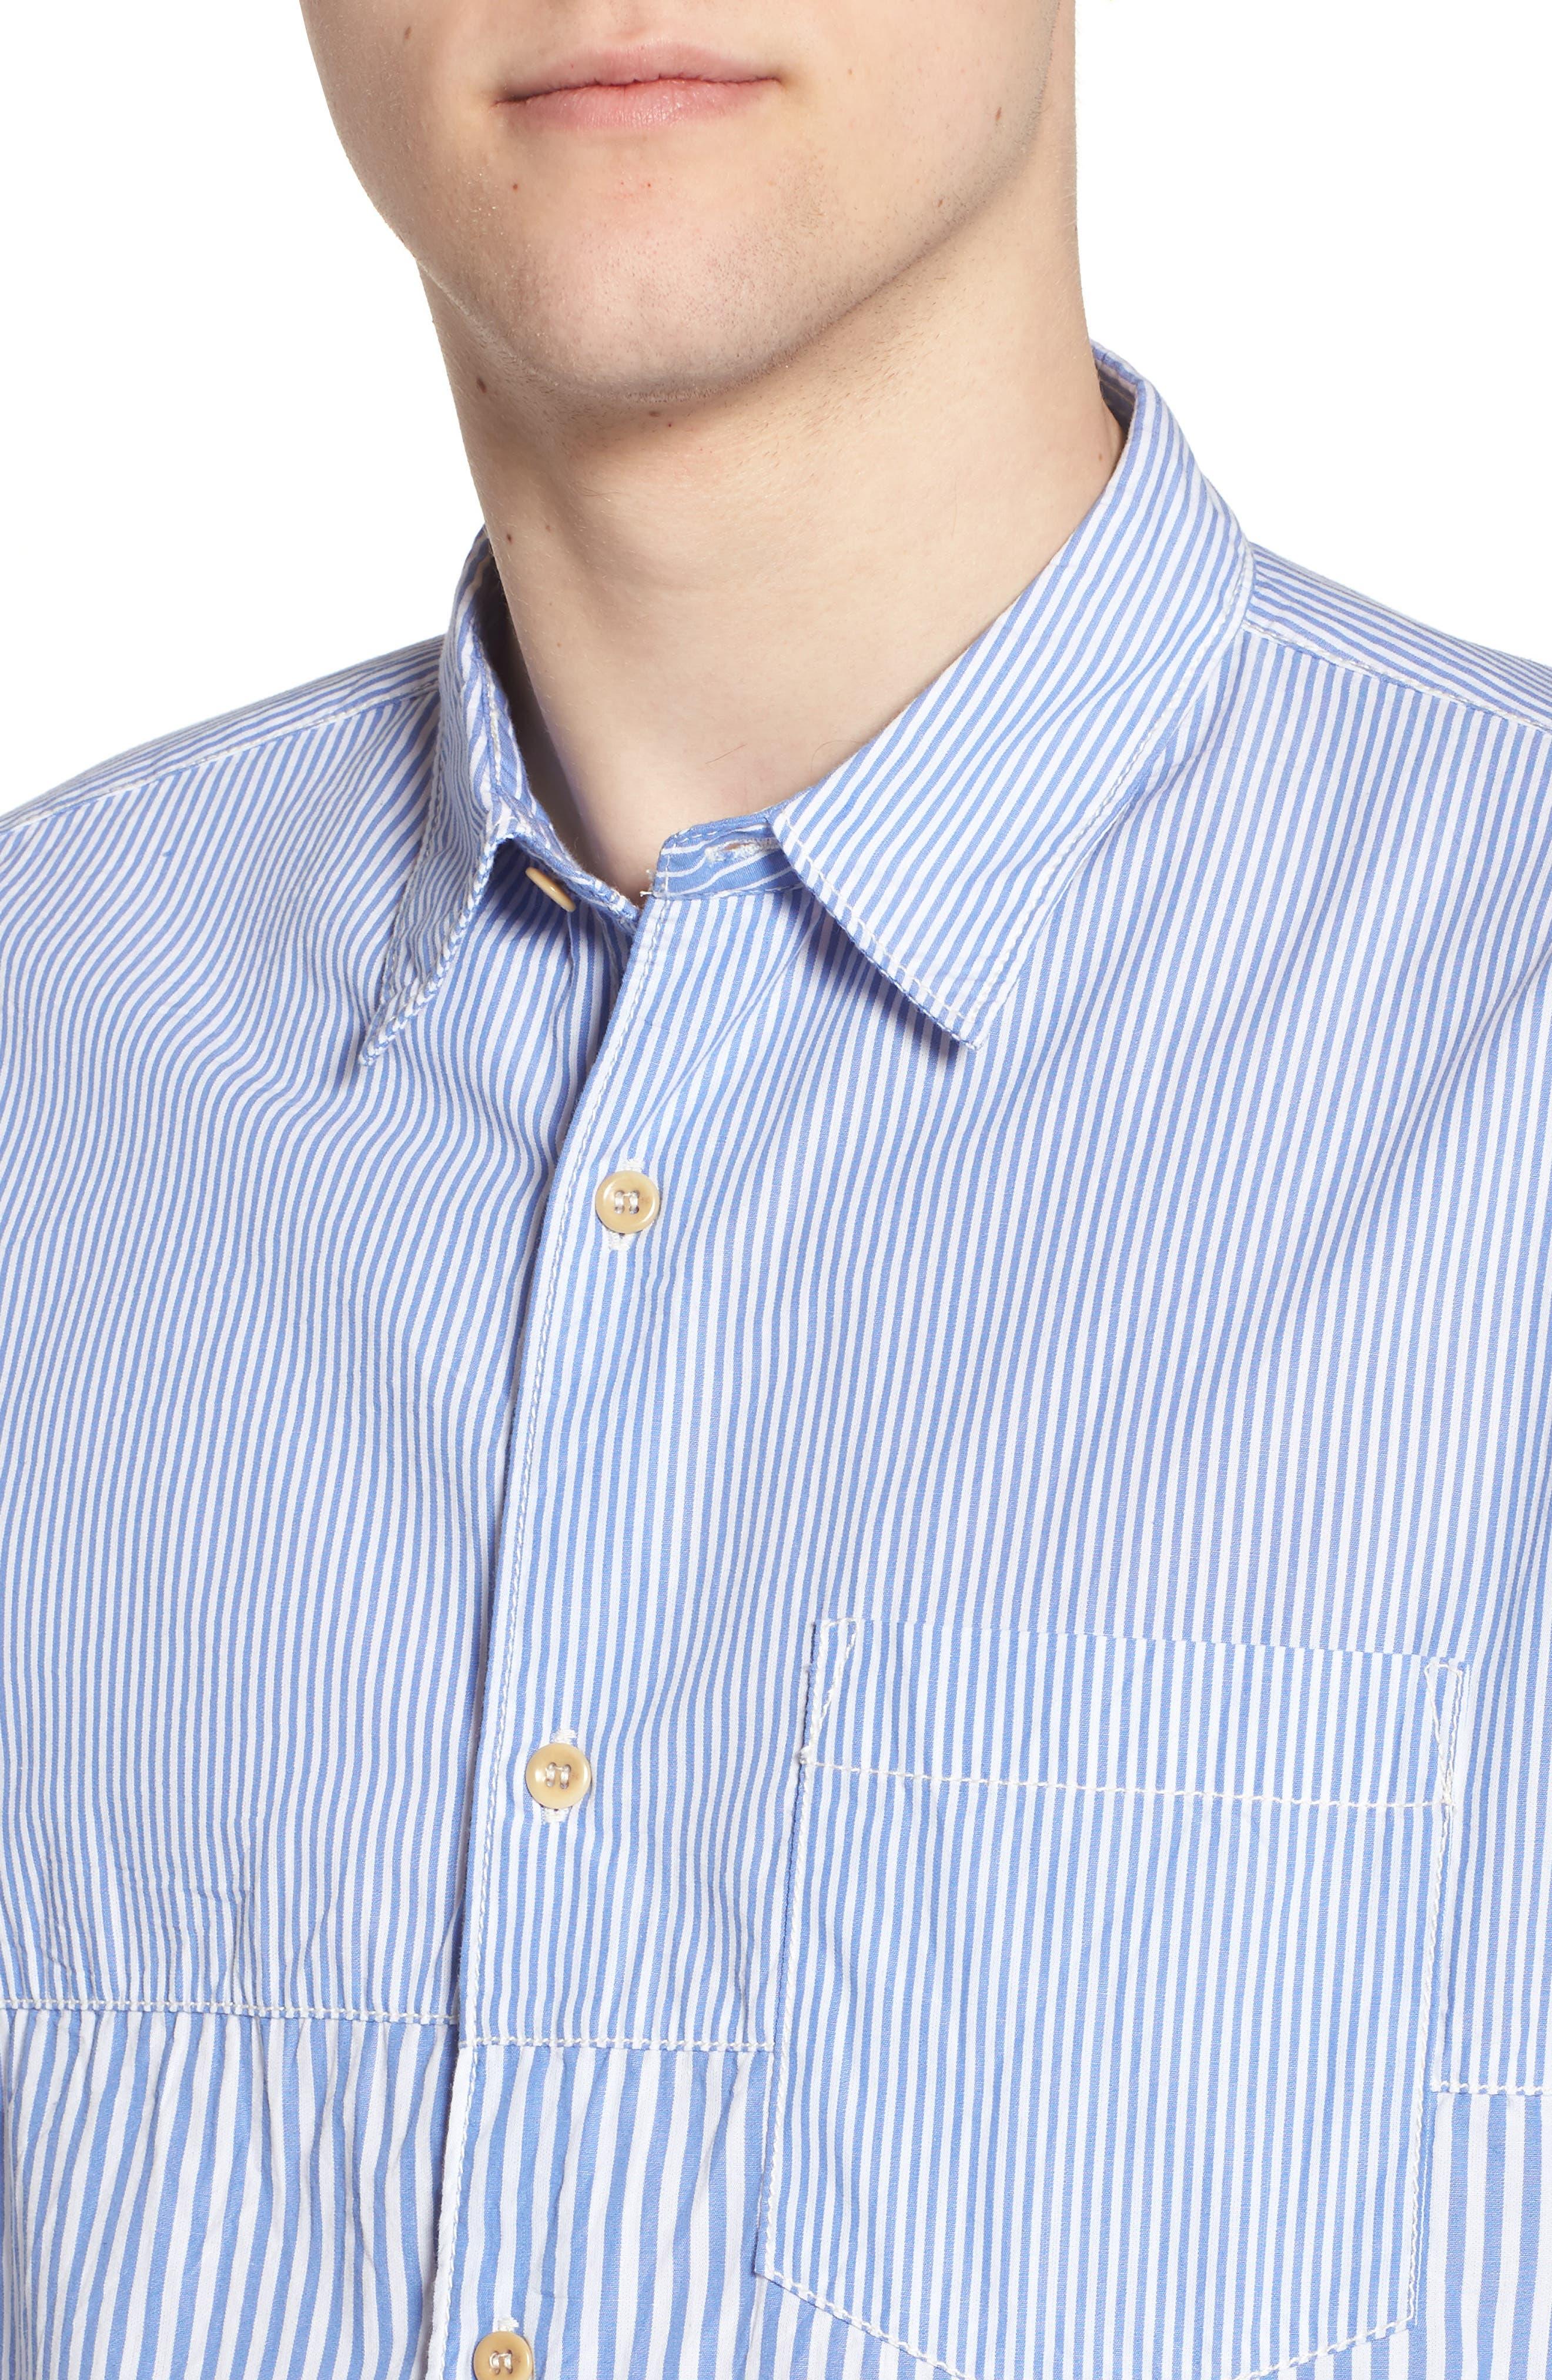 Regular Fit Stripe Sport Shirt,                             Alternate thumbnail 4, color,                             400